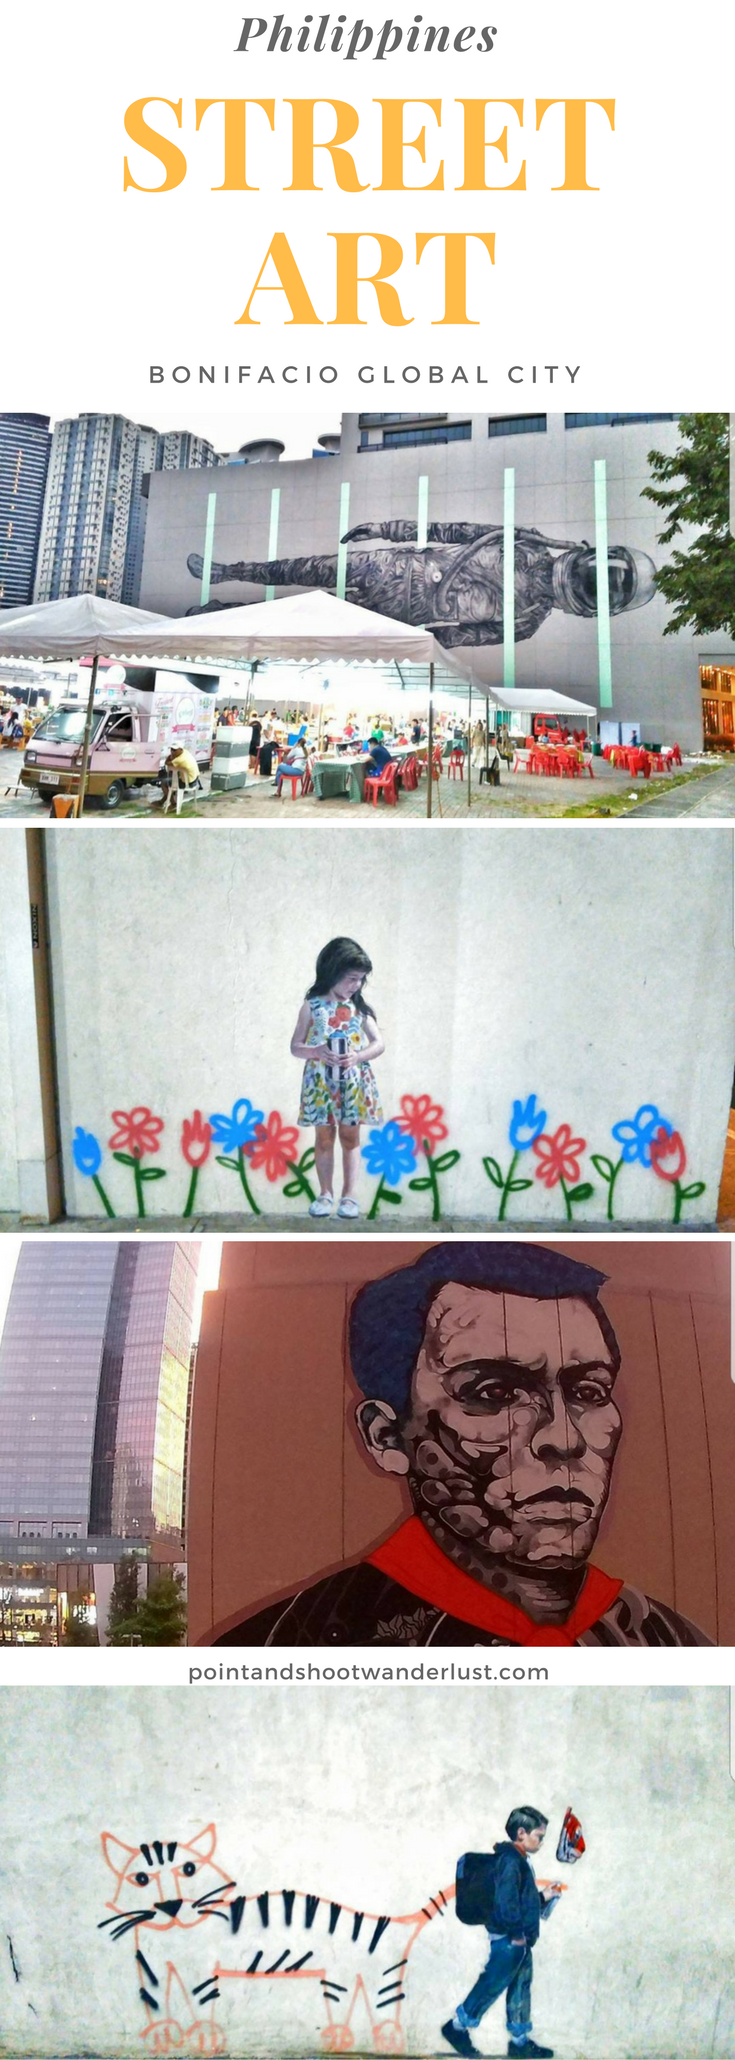 Street Art   Philippines   Bonifacio Global City Street Art   BGC Street Art   Street Photography   Where to find street art in Philippines   Asia   Southeast Asia   Art